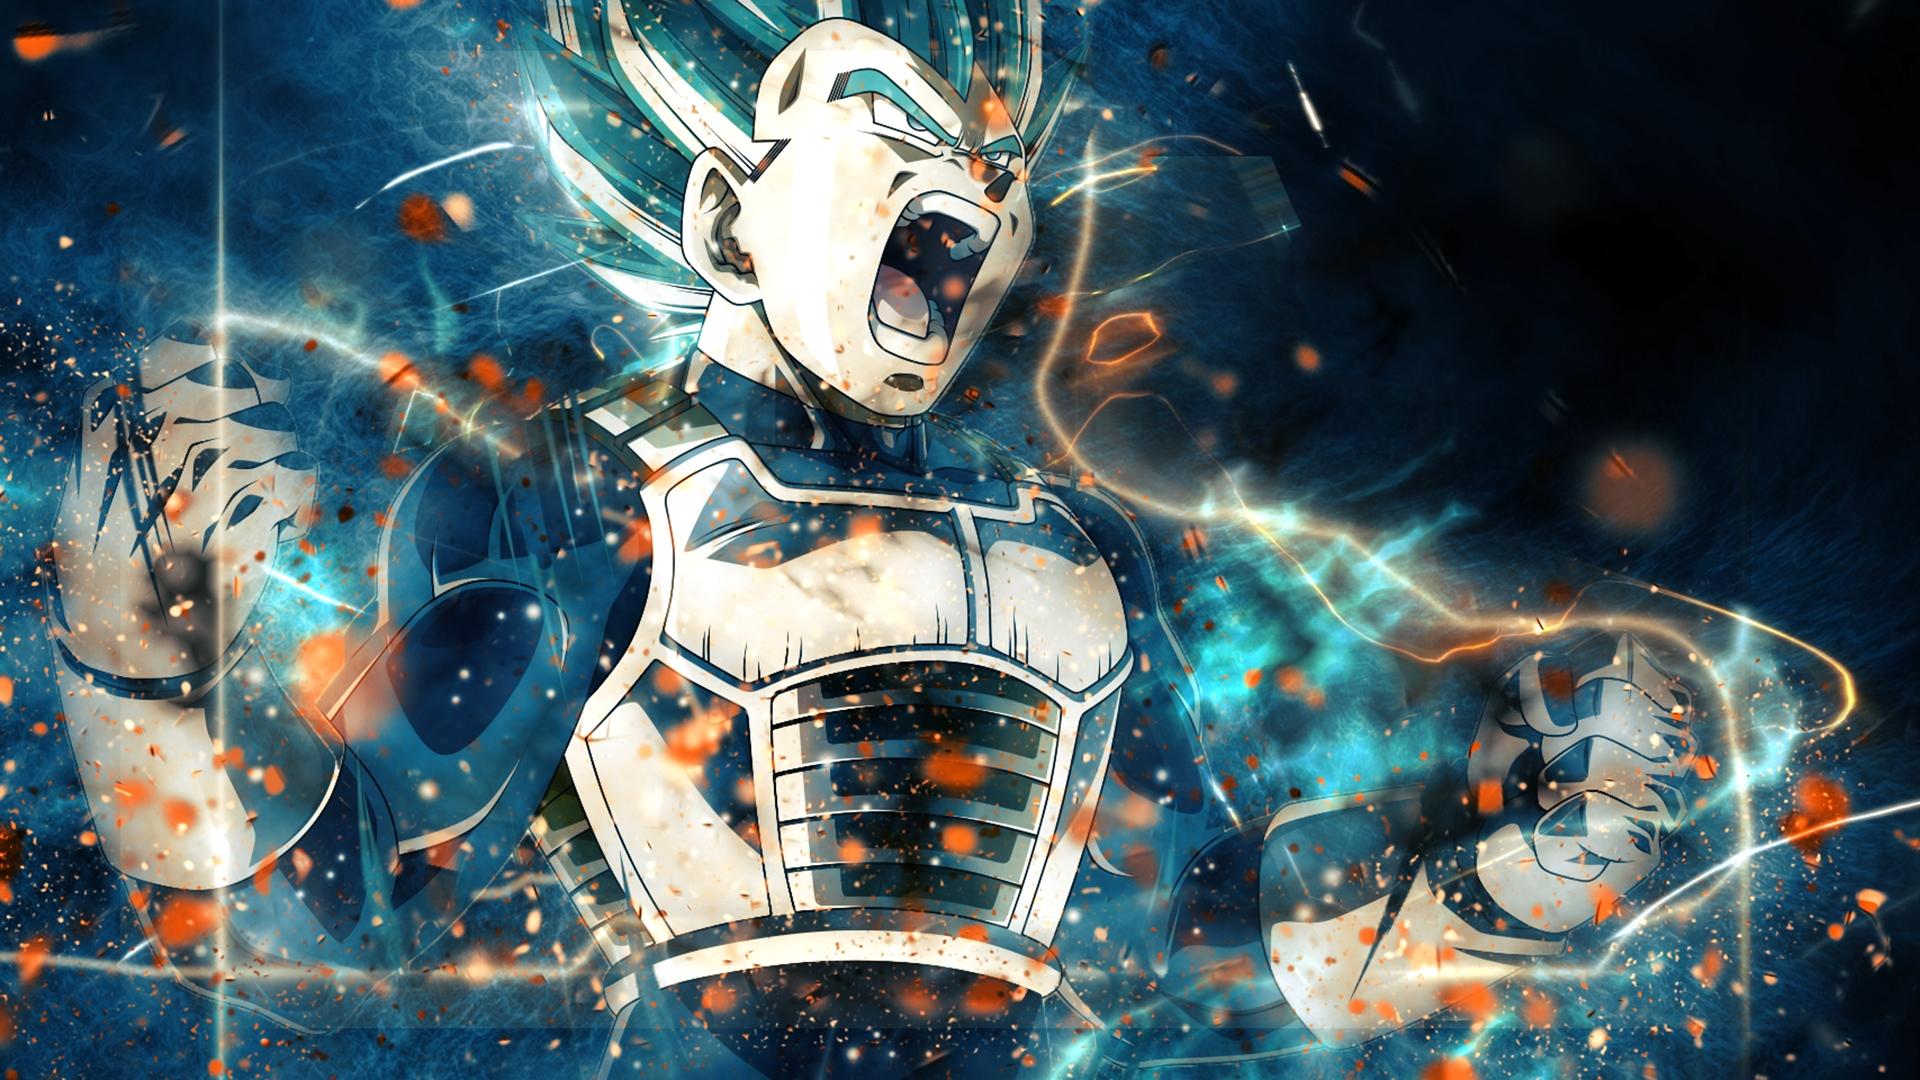 Dragon Ball Super - Vegeta HD Wallpaper | Background Image | 1920x1080 | ID:922137 - Wallpaper Abyss